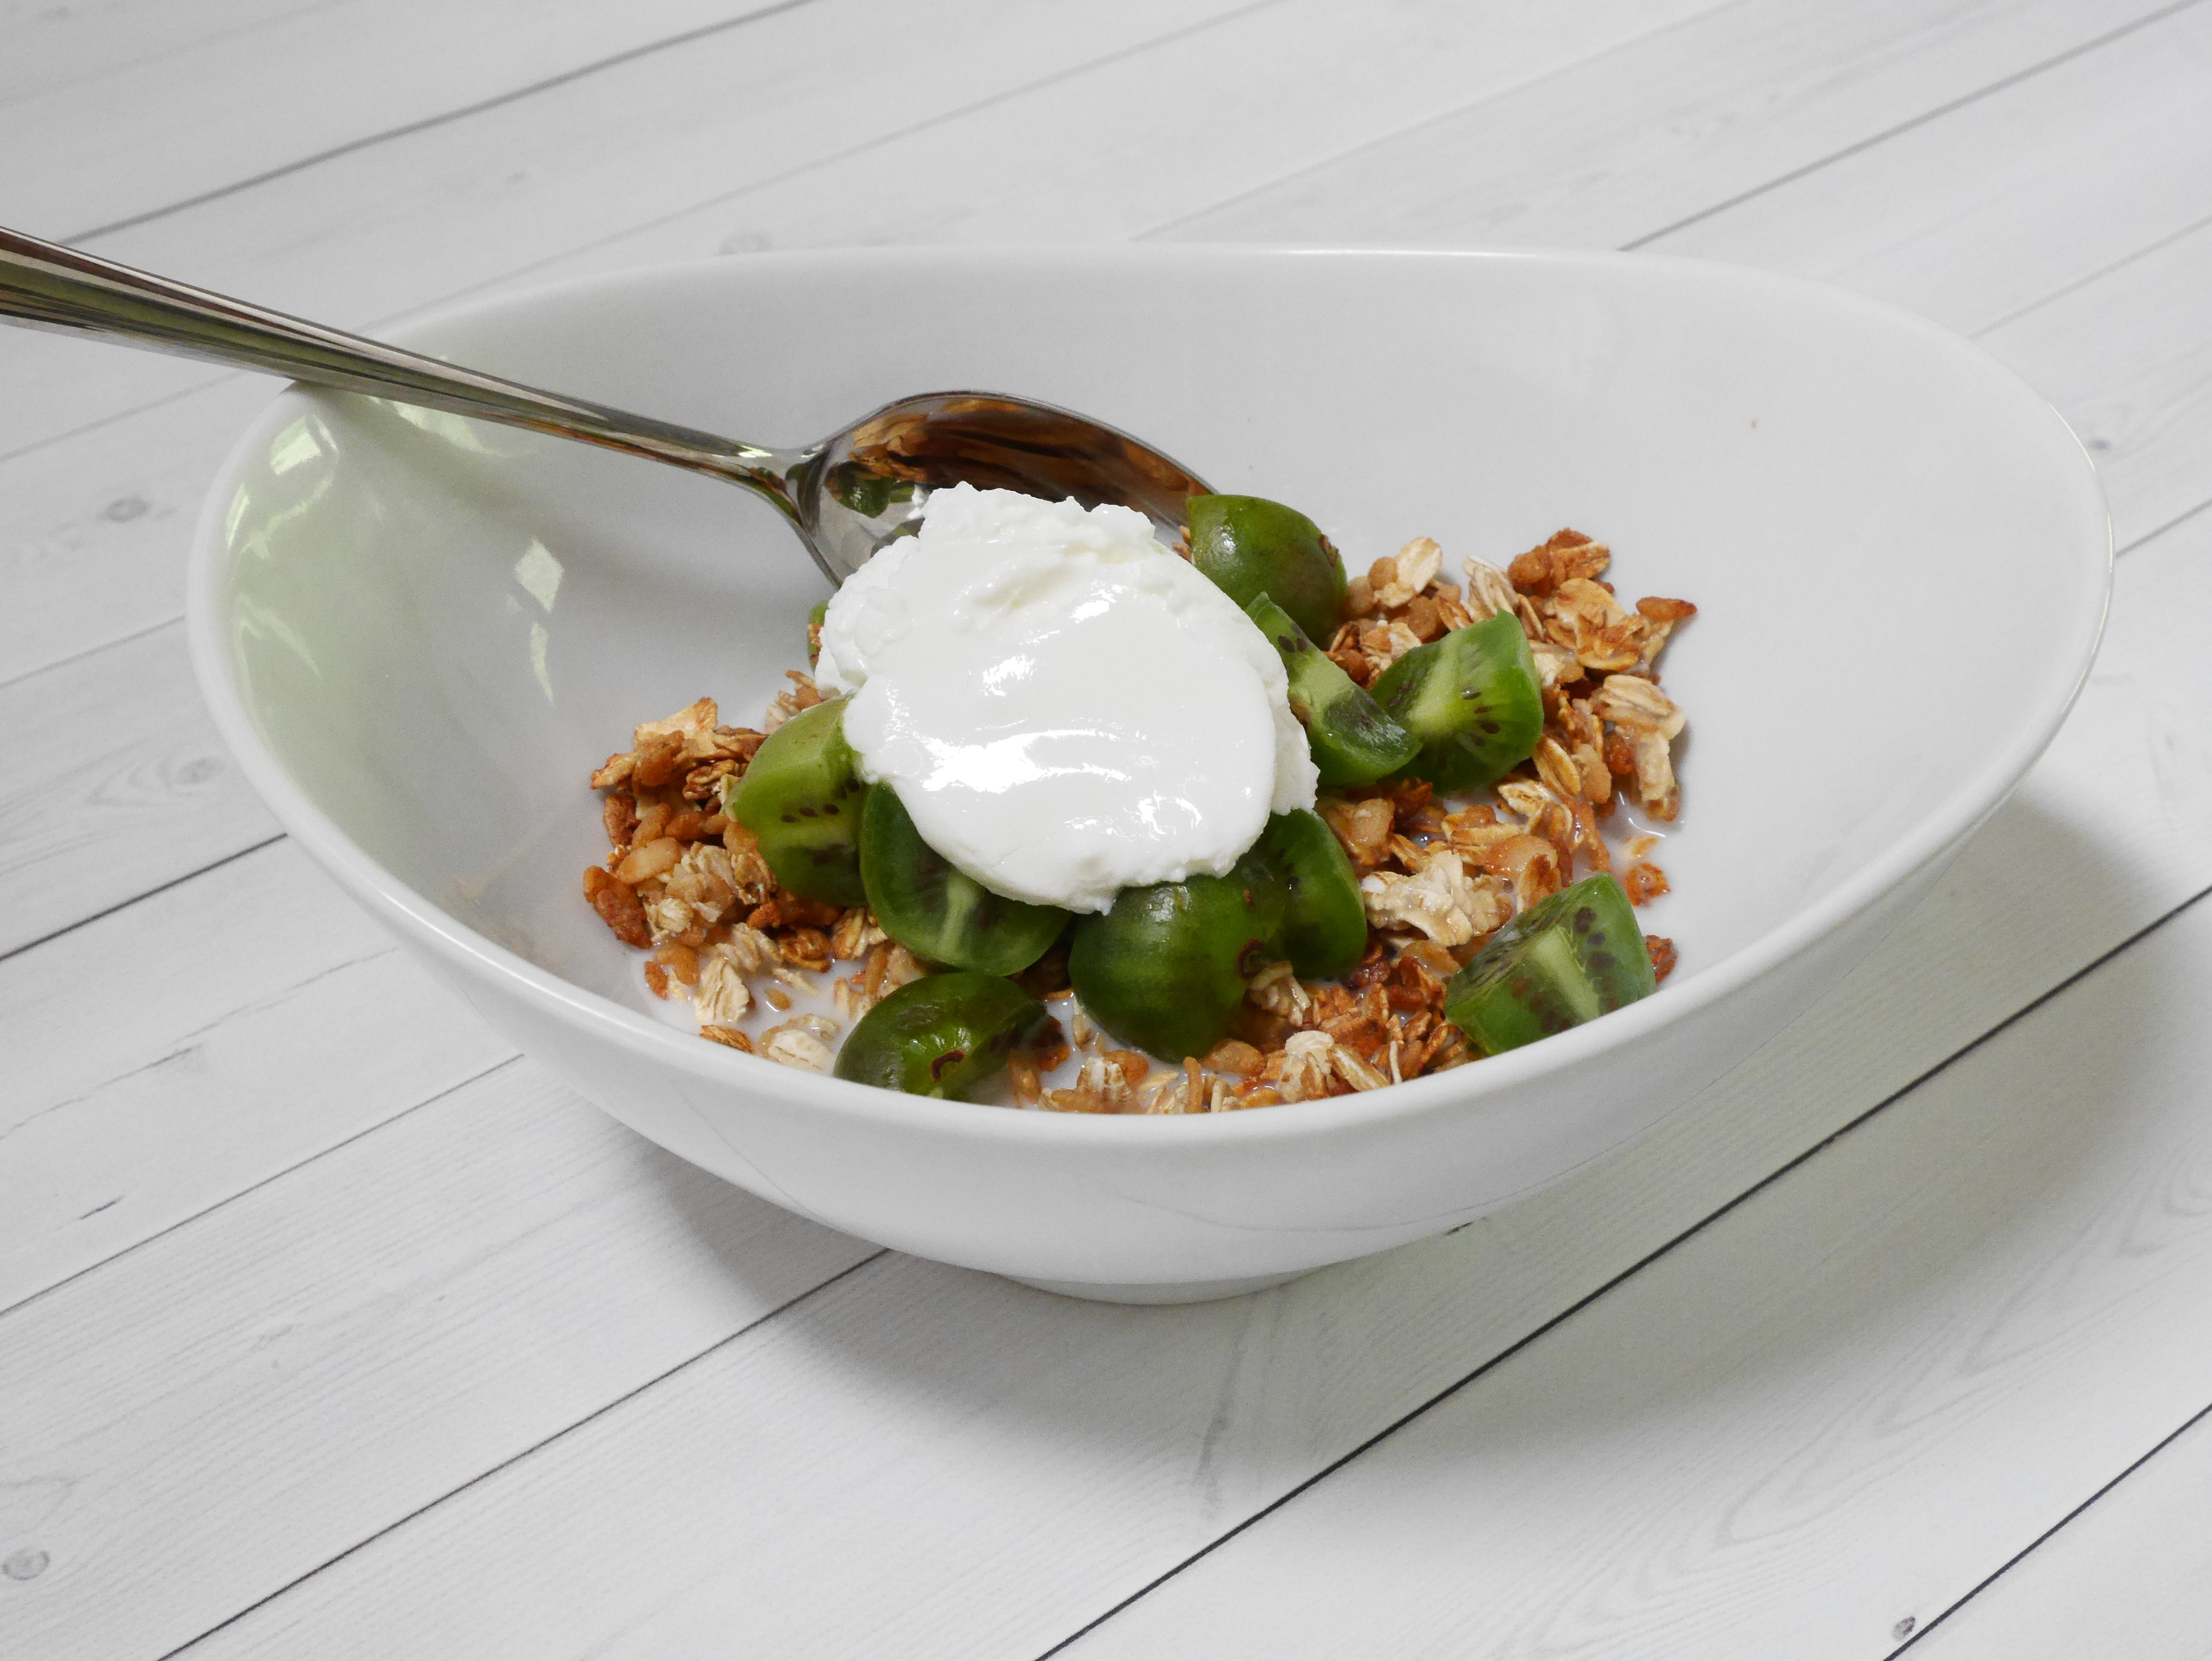 Image of quick and simple granola recipe from CALMERme.com